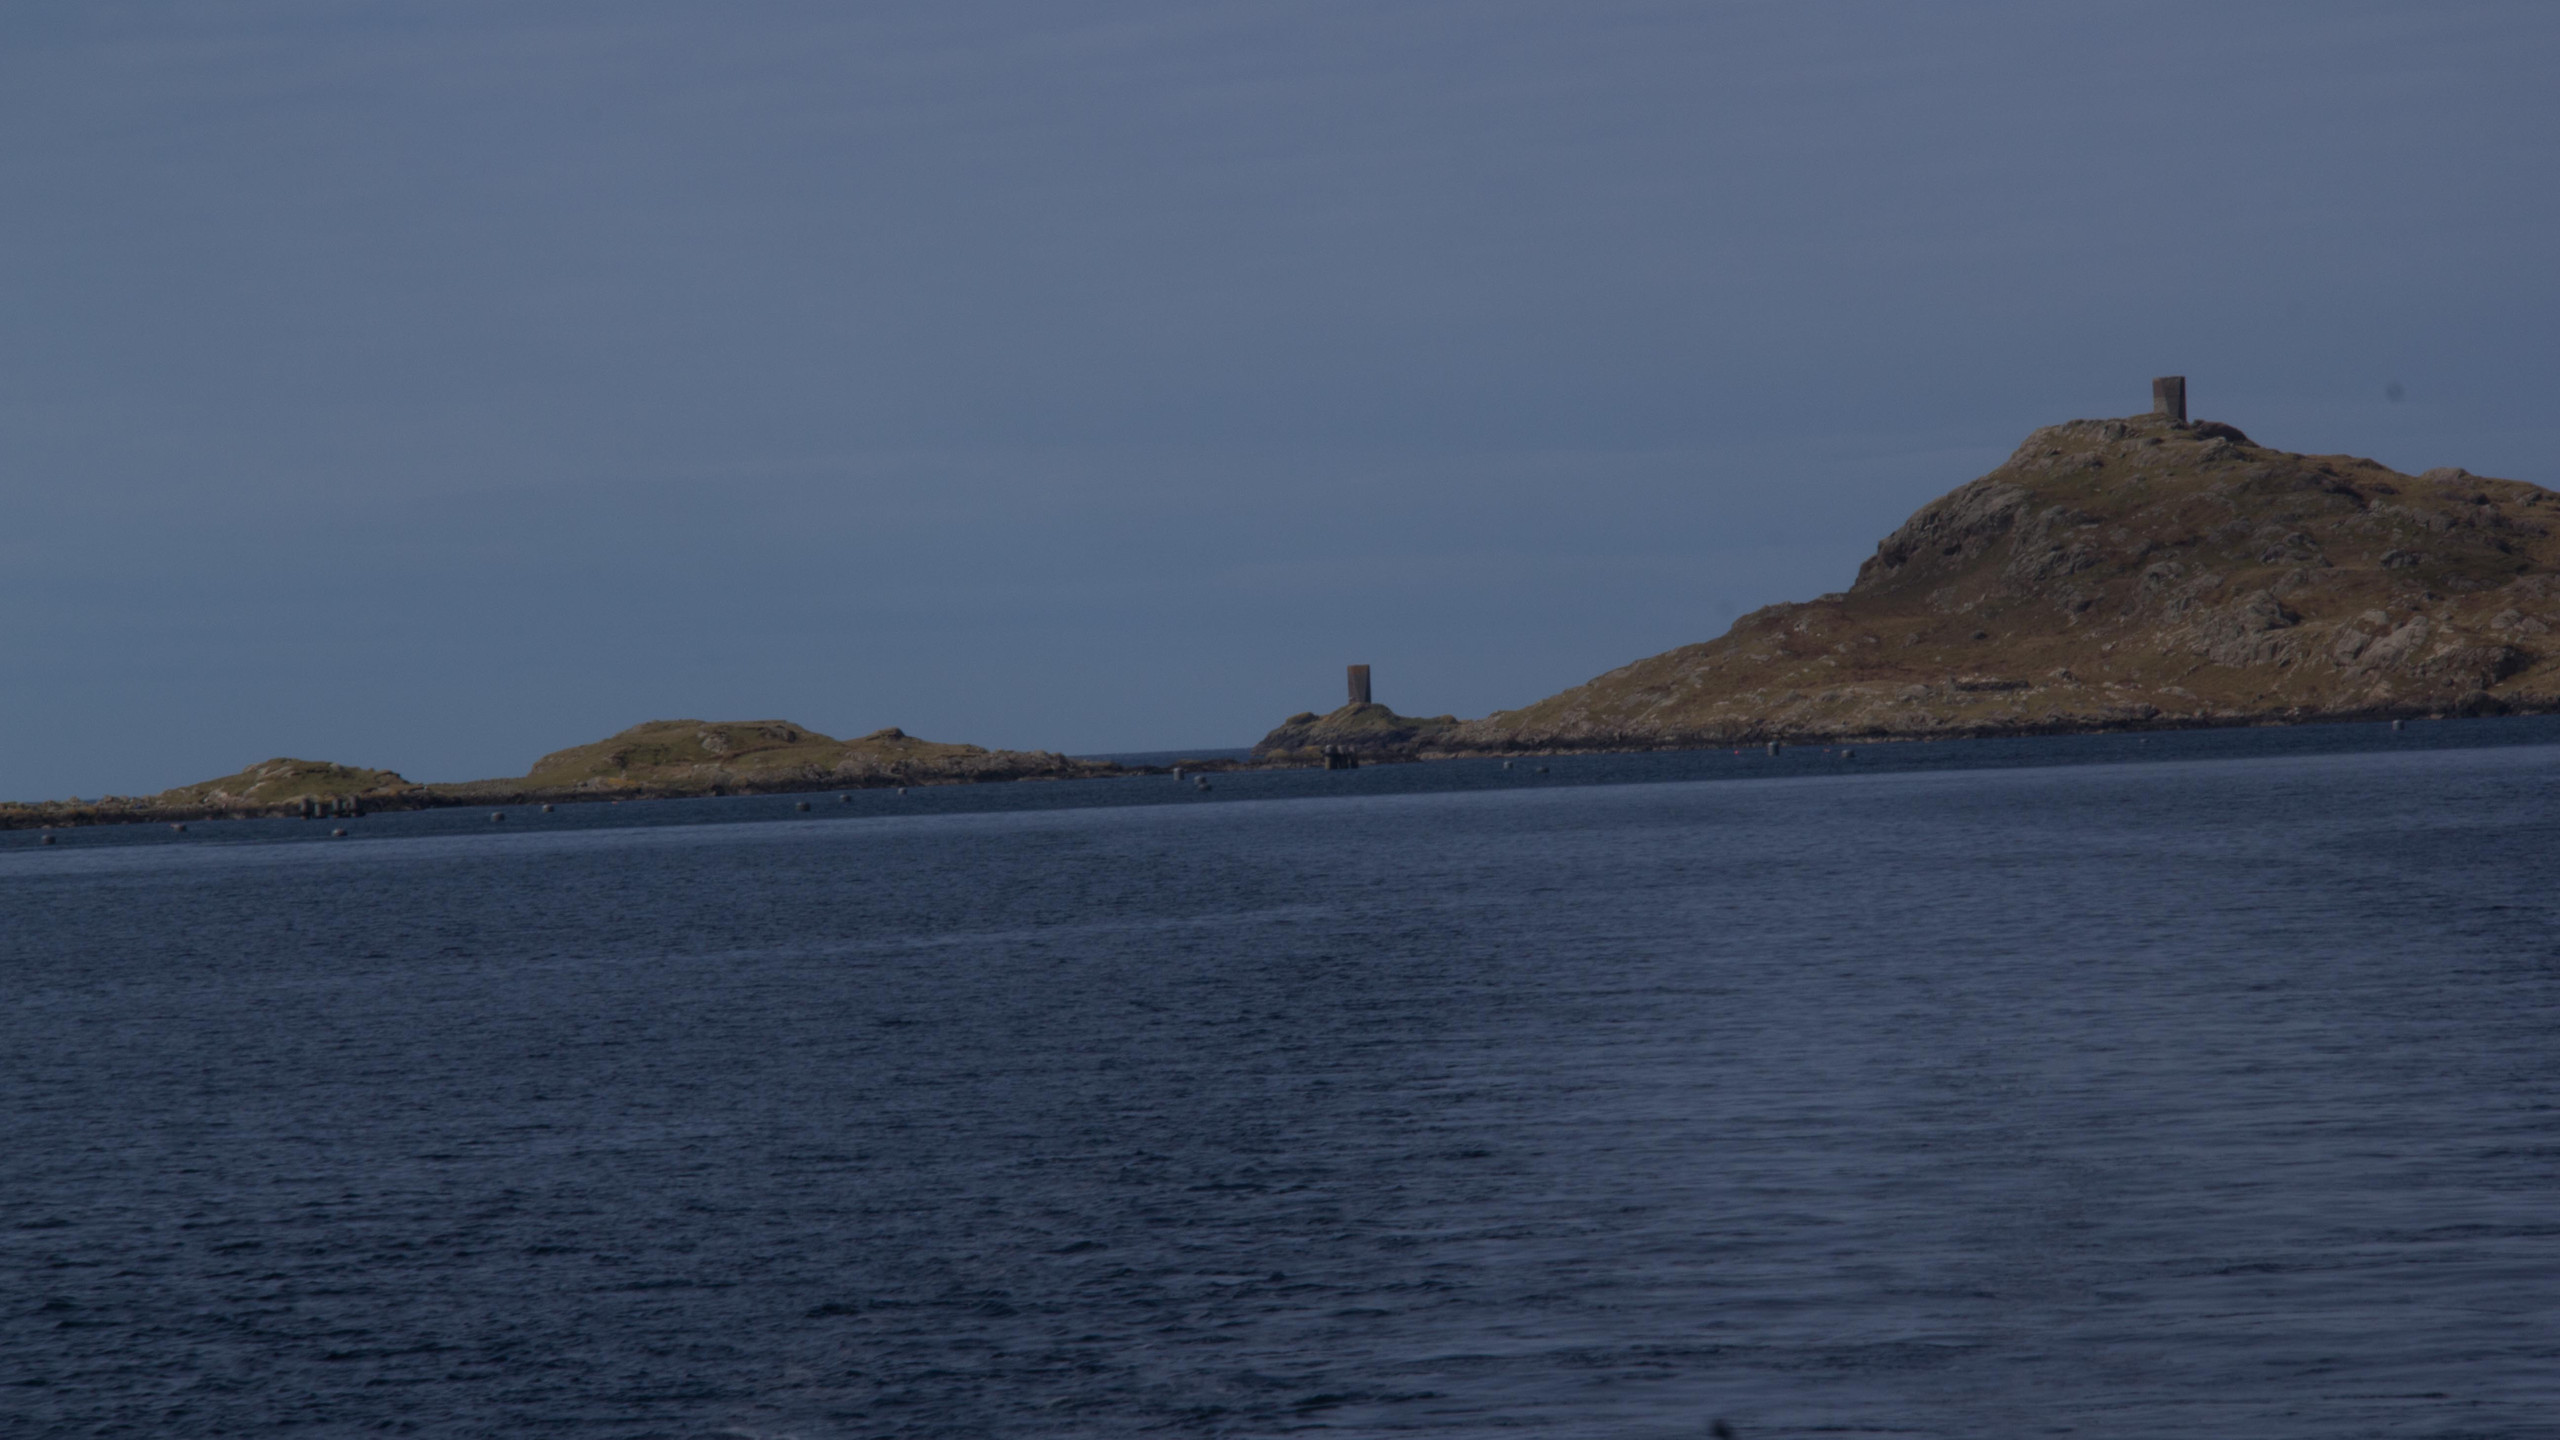 Navigation towers